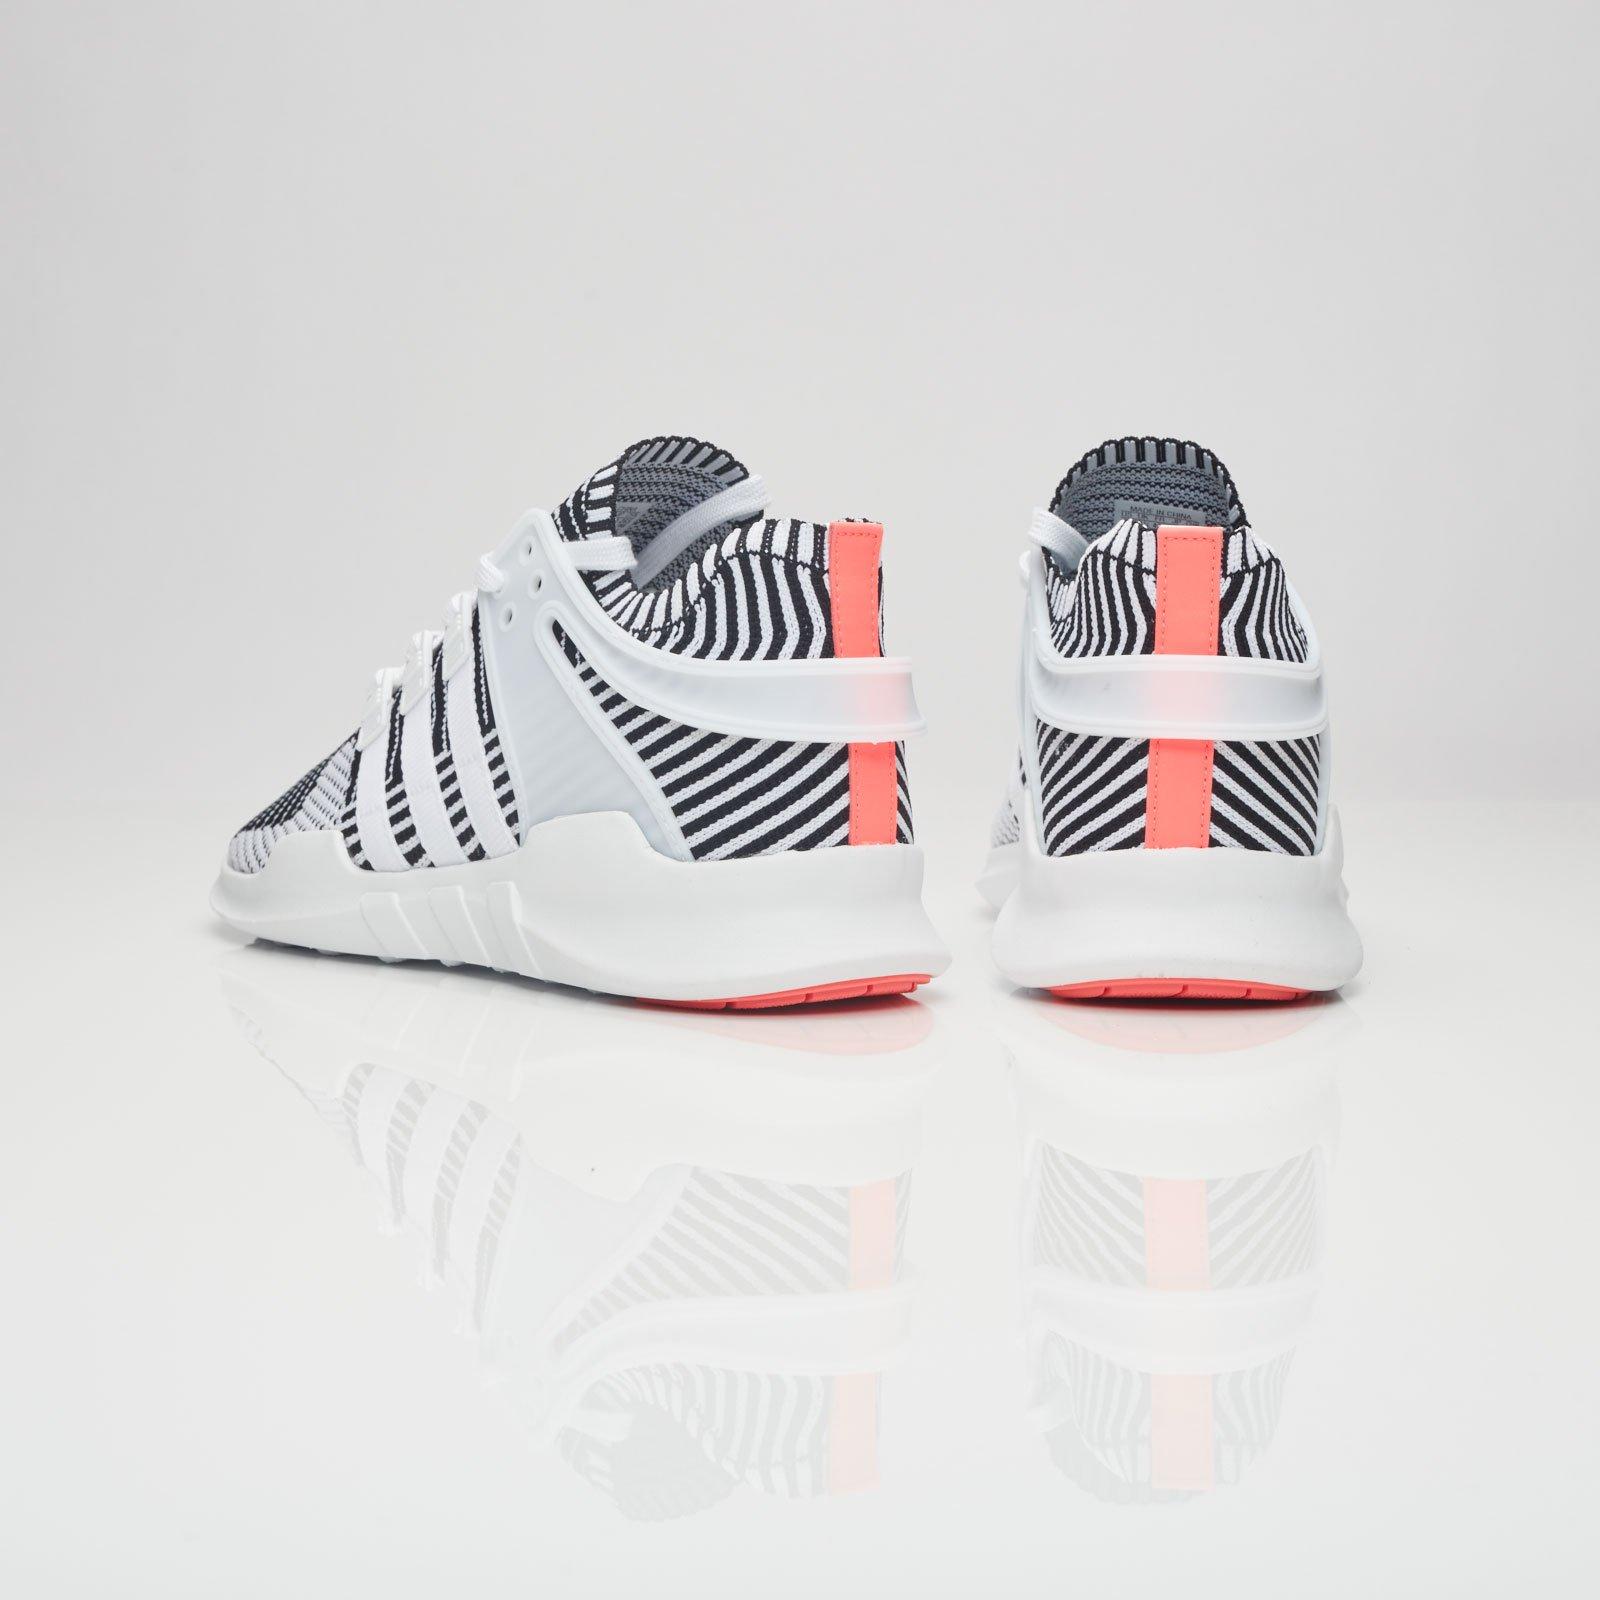 new product bef93 f1979 adidas Eqt Support Adv Pk - Ba7496 - Sneakersnstuff ...